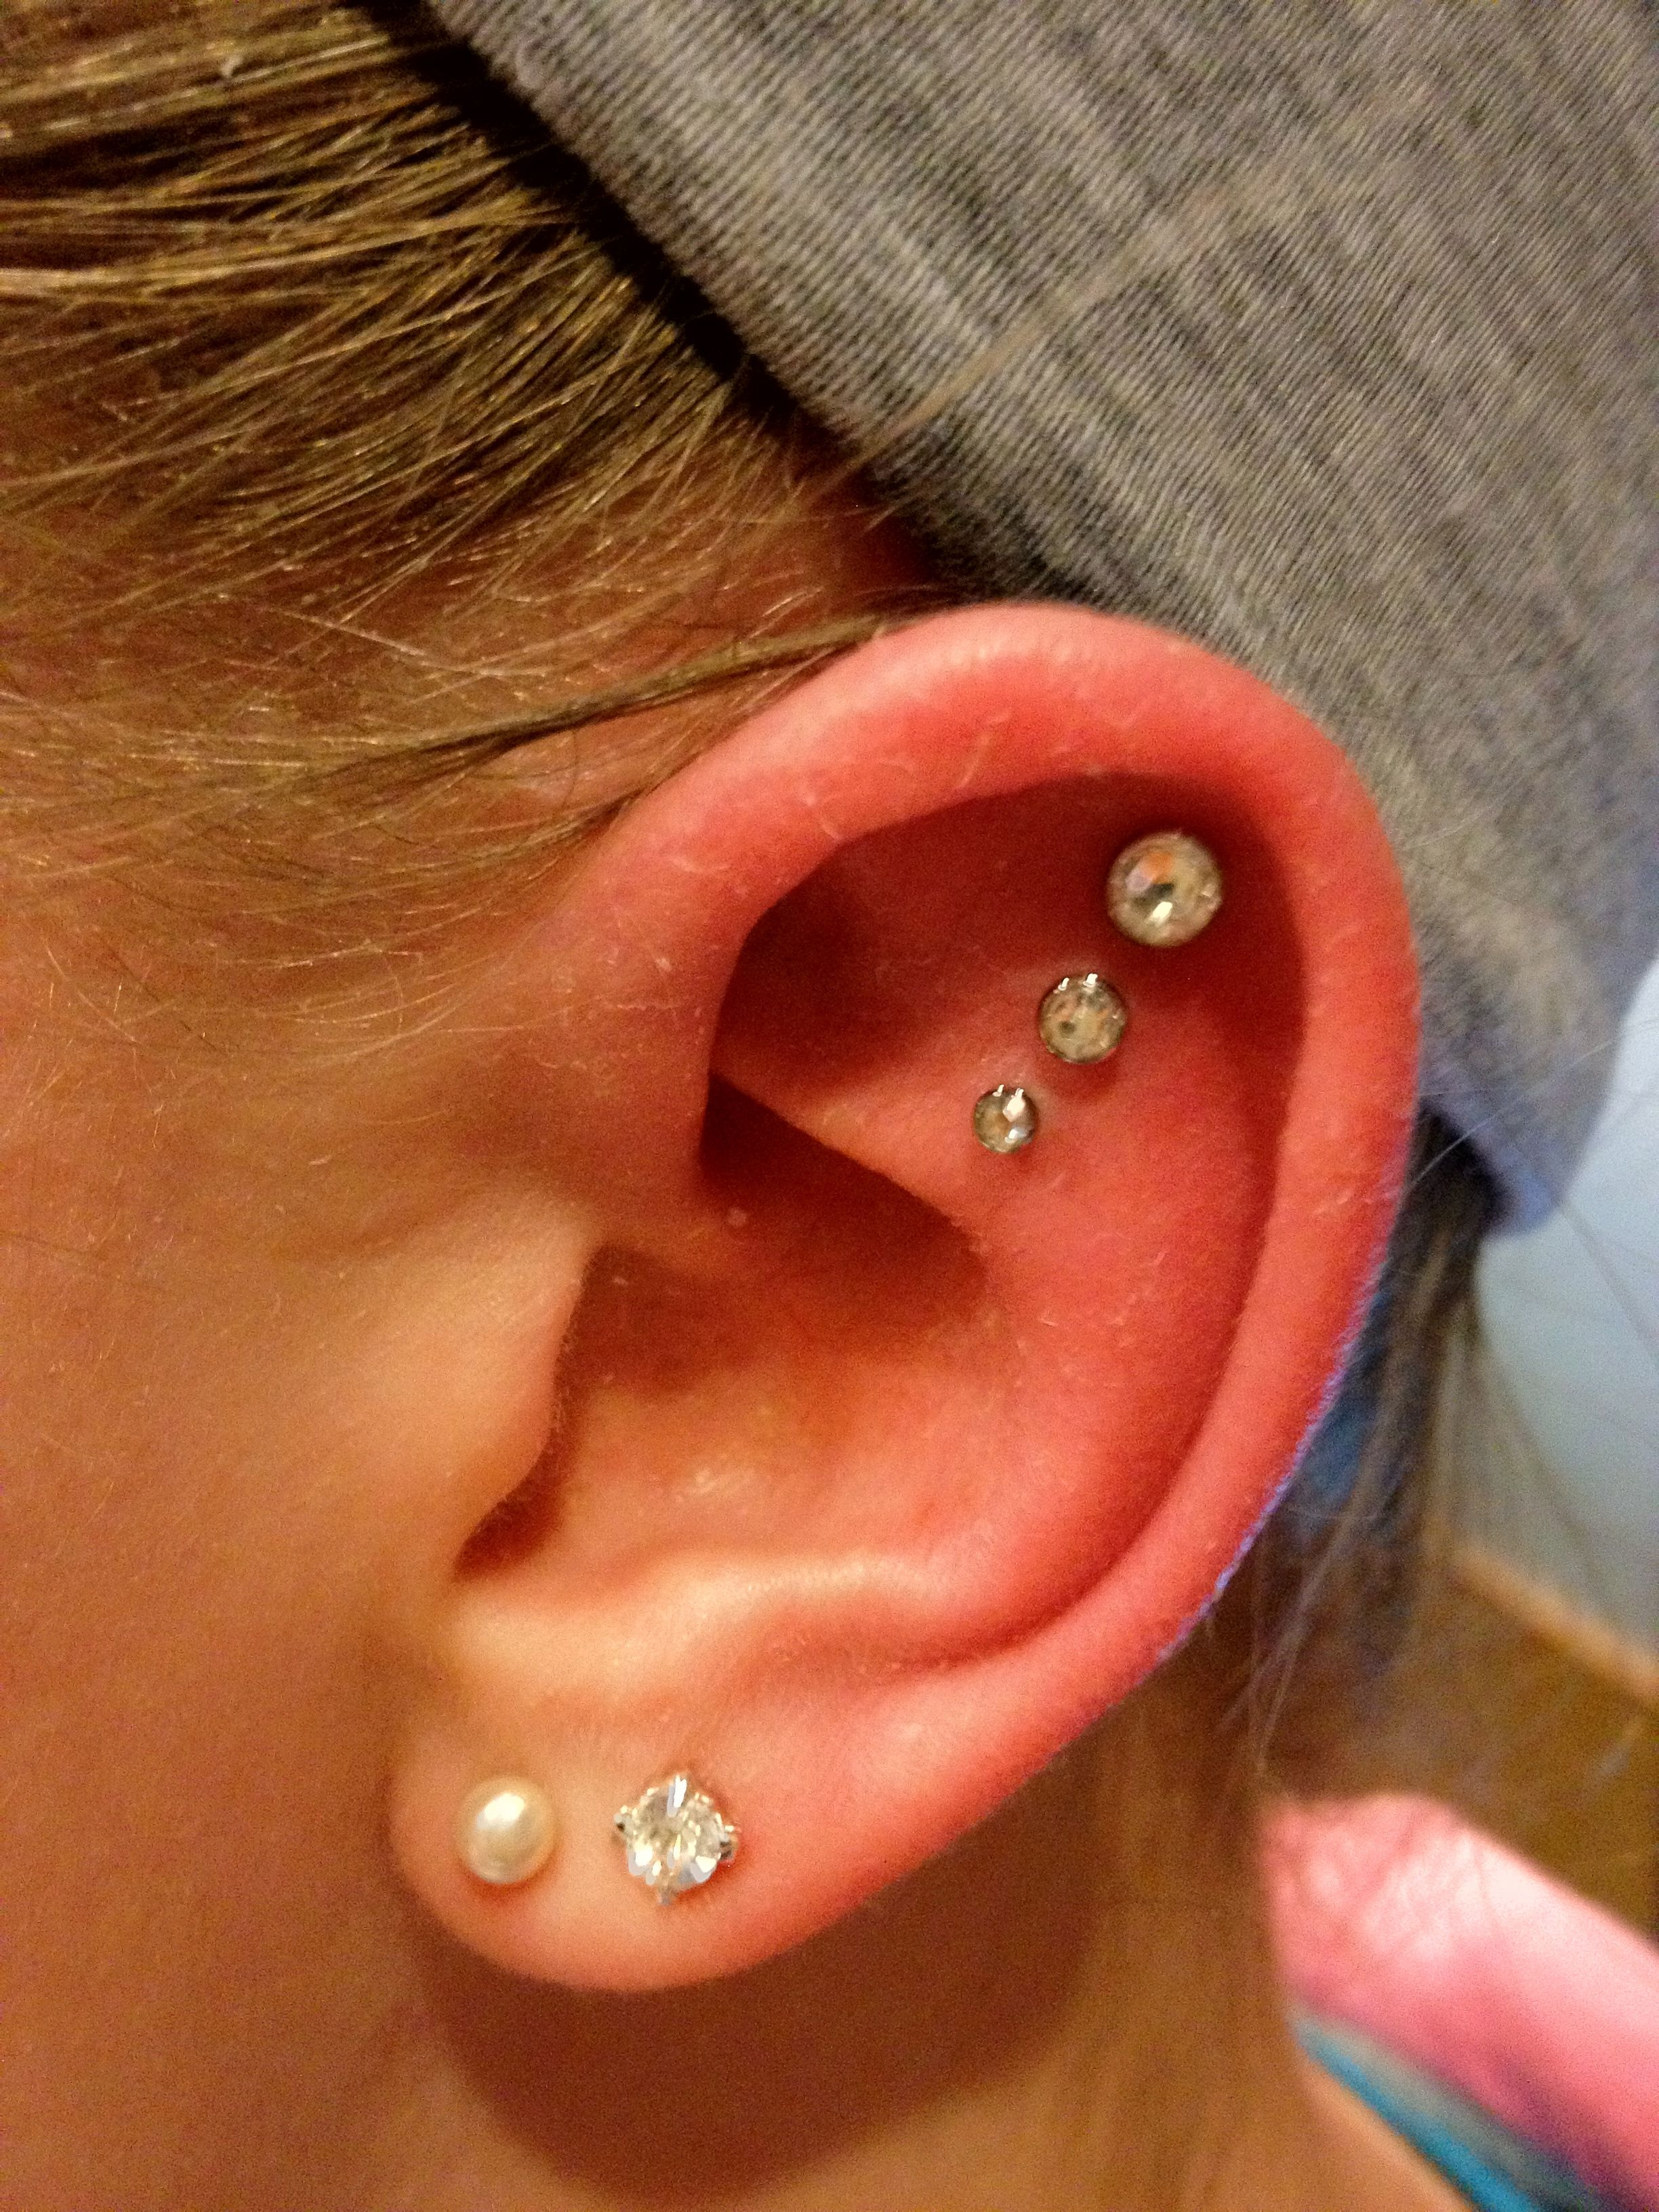 Triple swarkovski crystal inner cartilage piercing ...